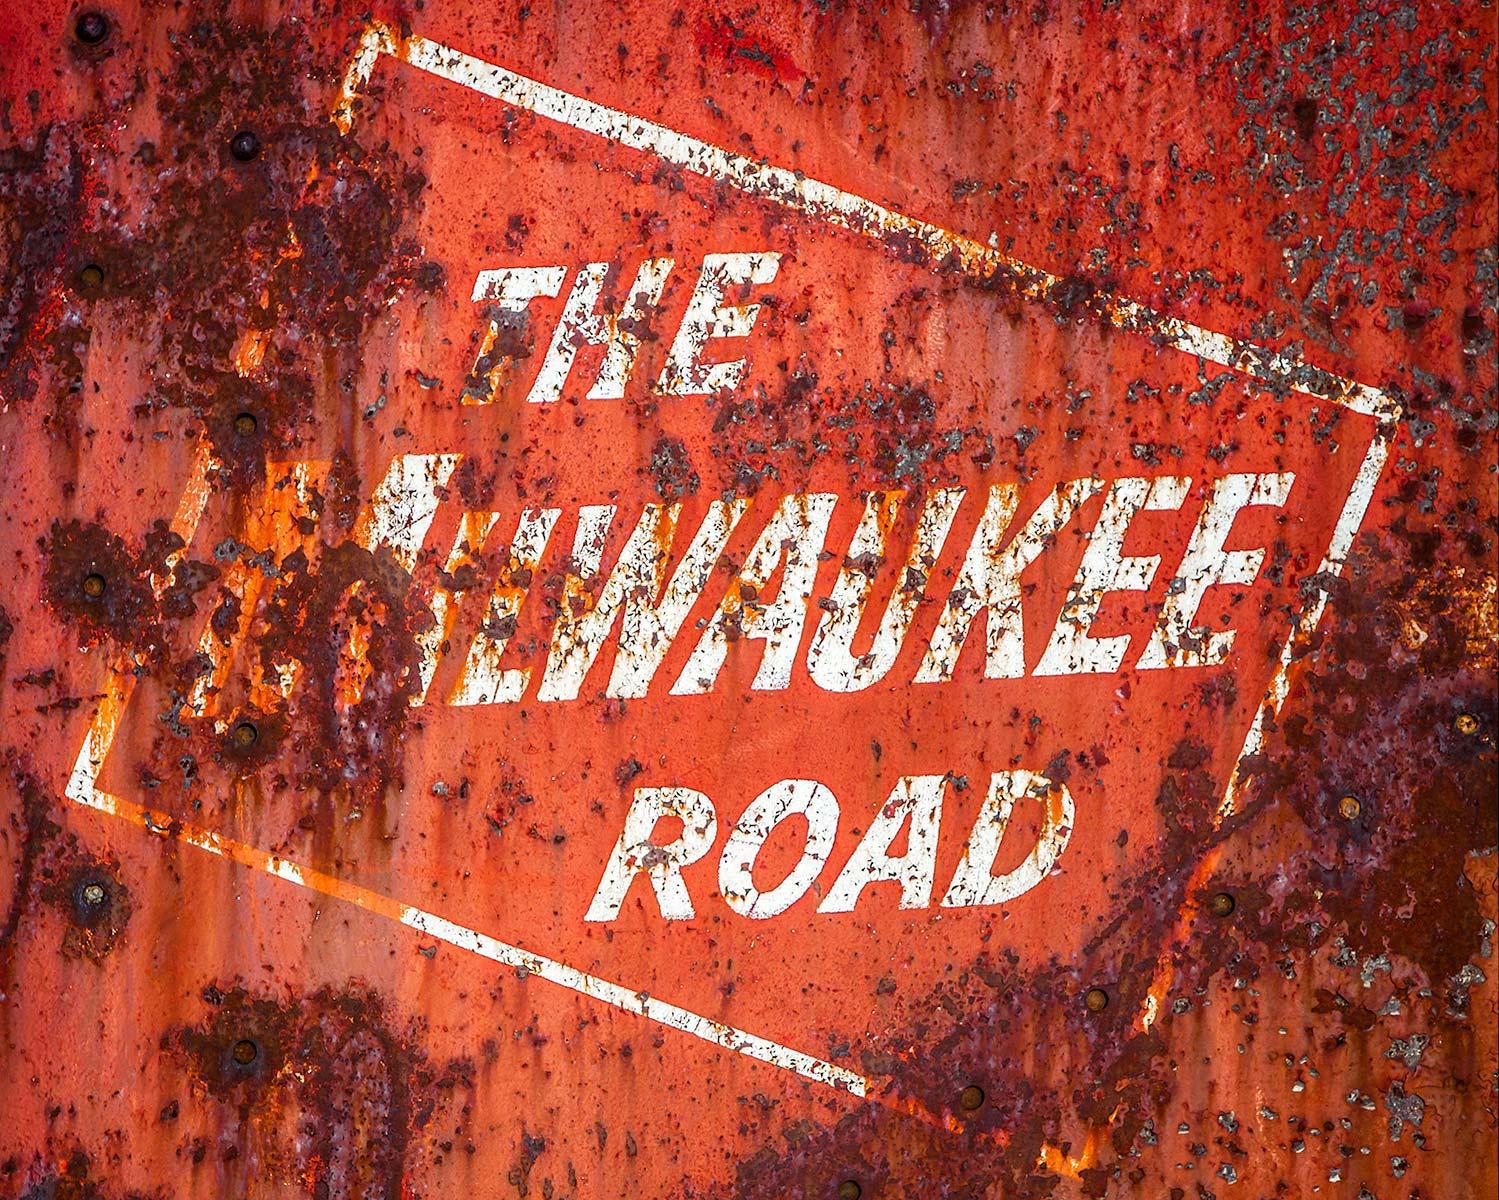 The Milwaukee Road